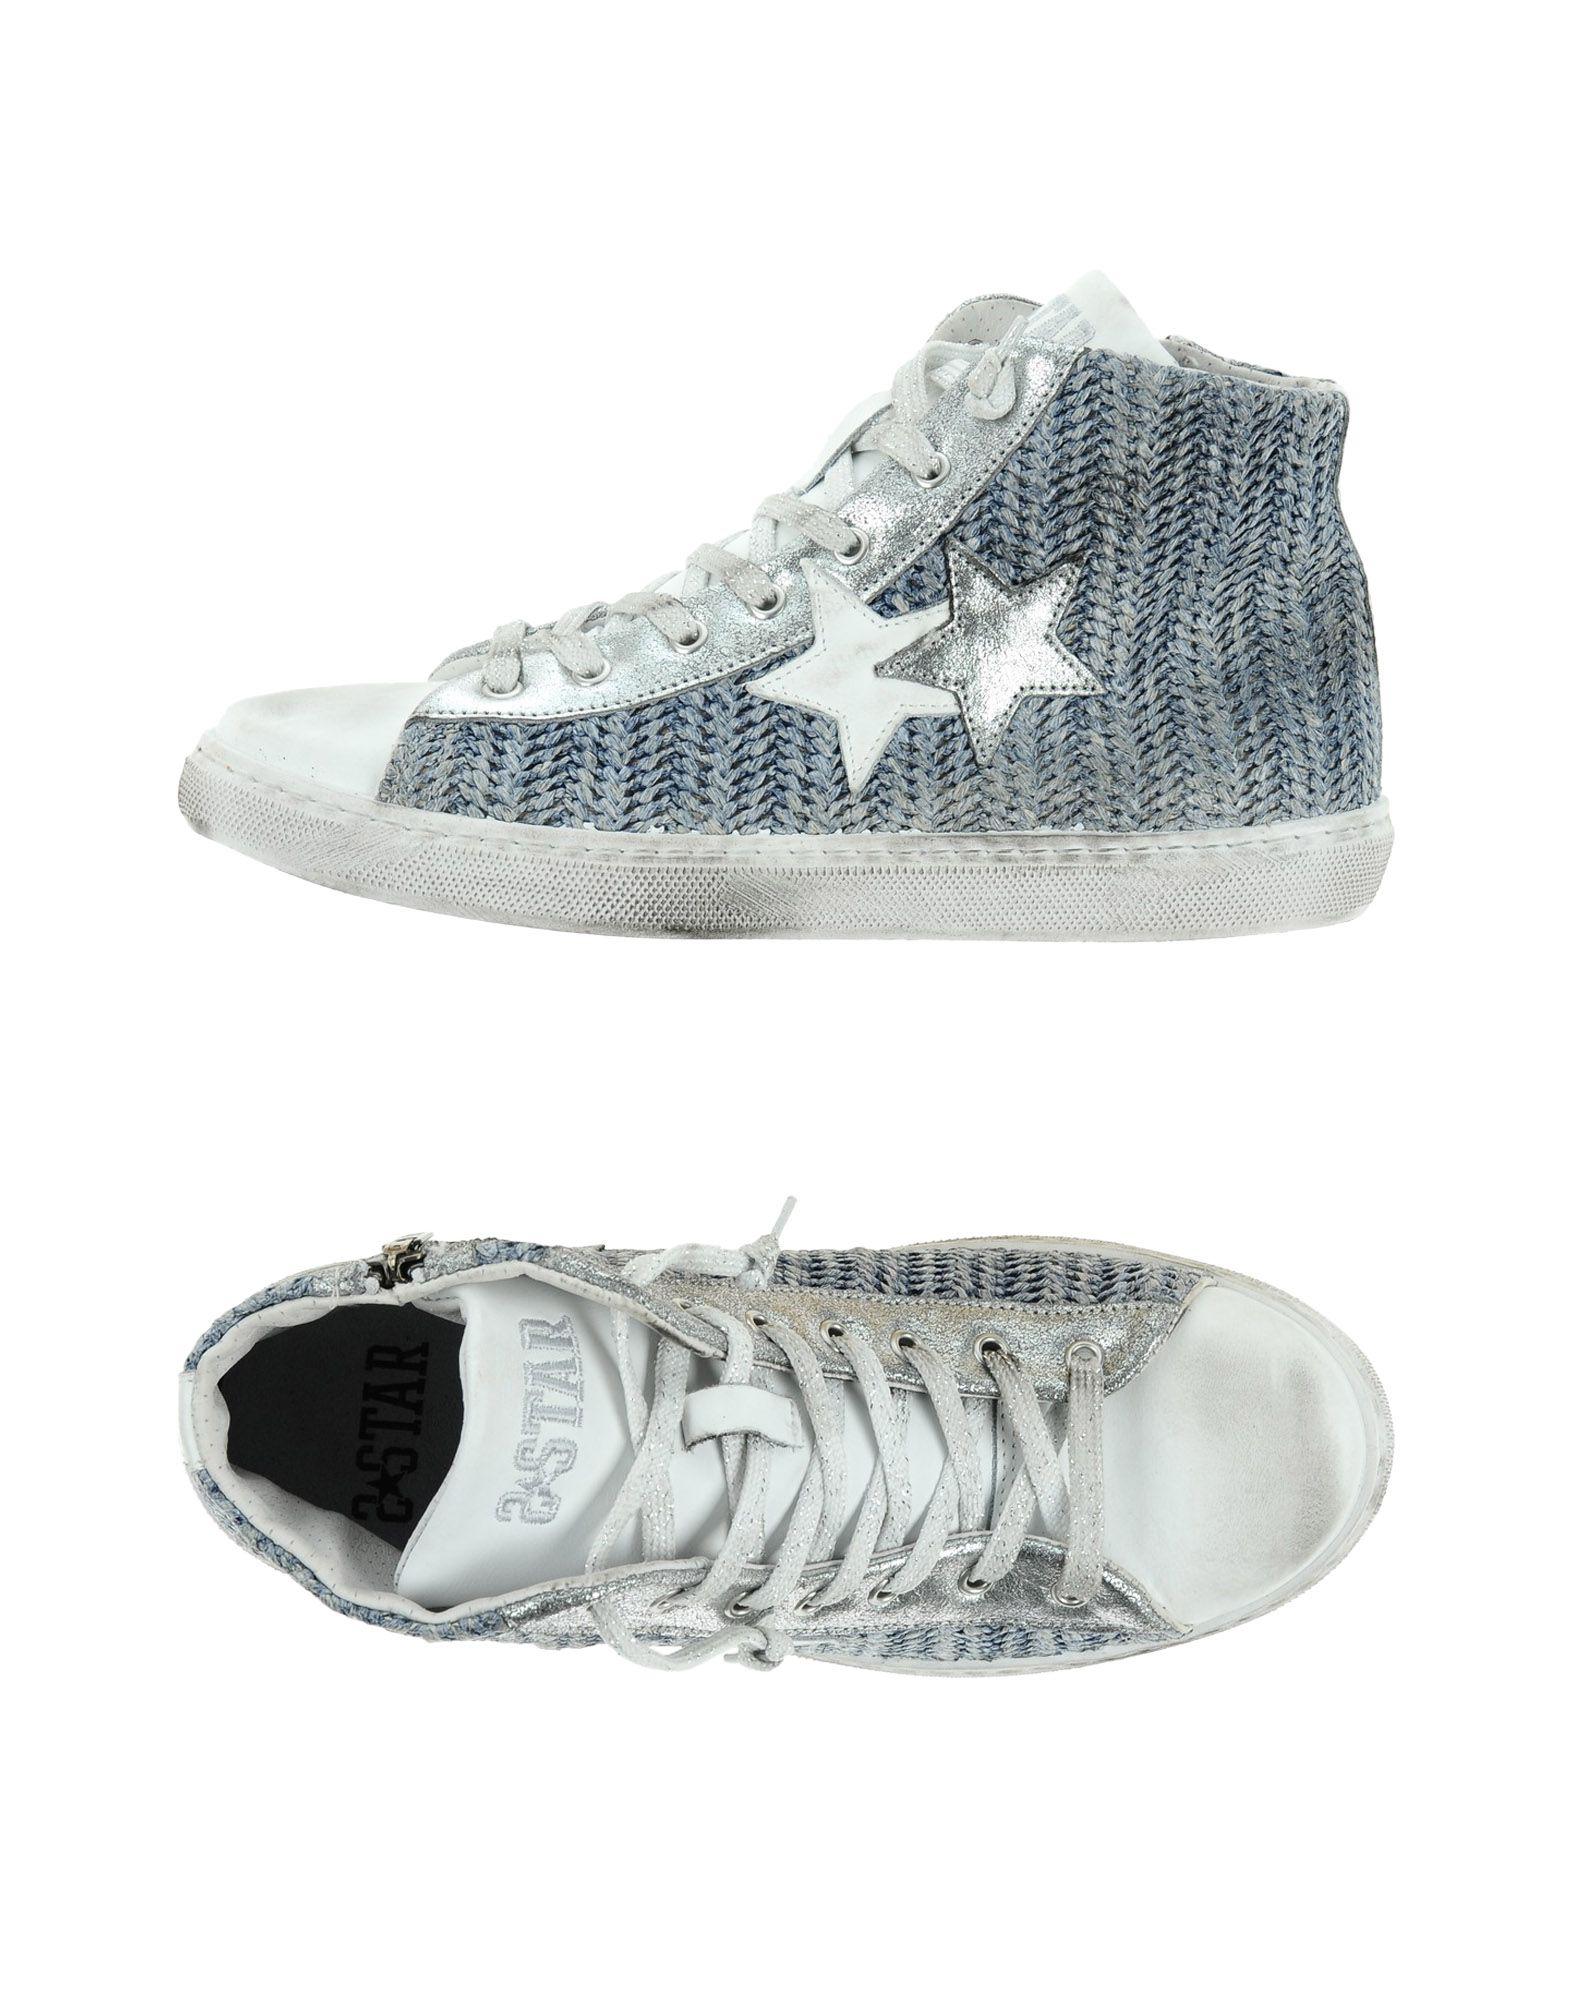 2Star Sneakers Sneakers - Women 2Star Sneakers 2Star online on  United Kingdom - 11336798QN 31769d